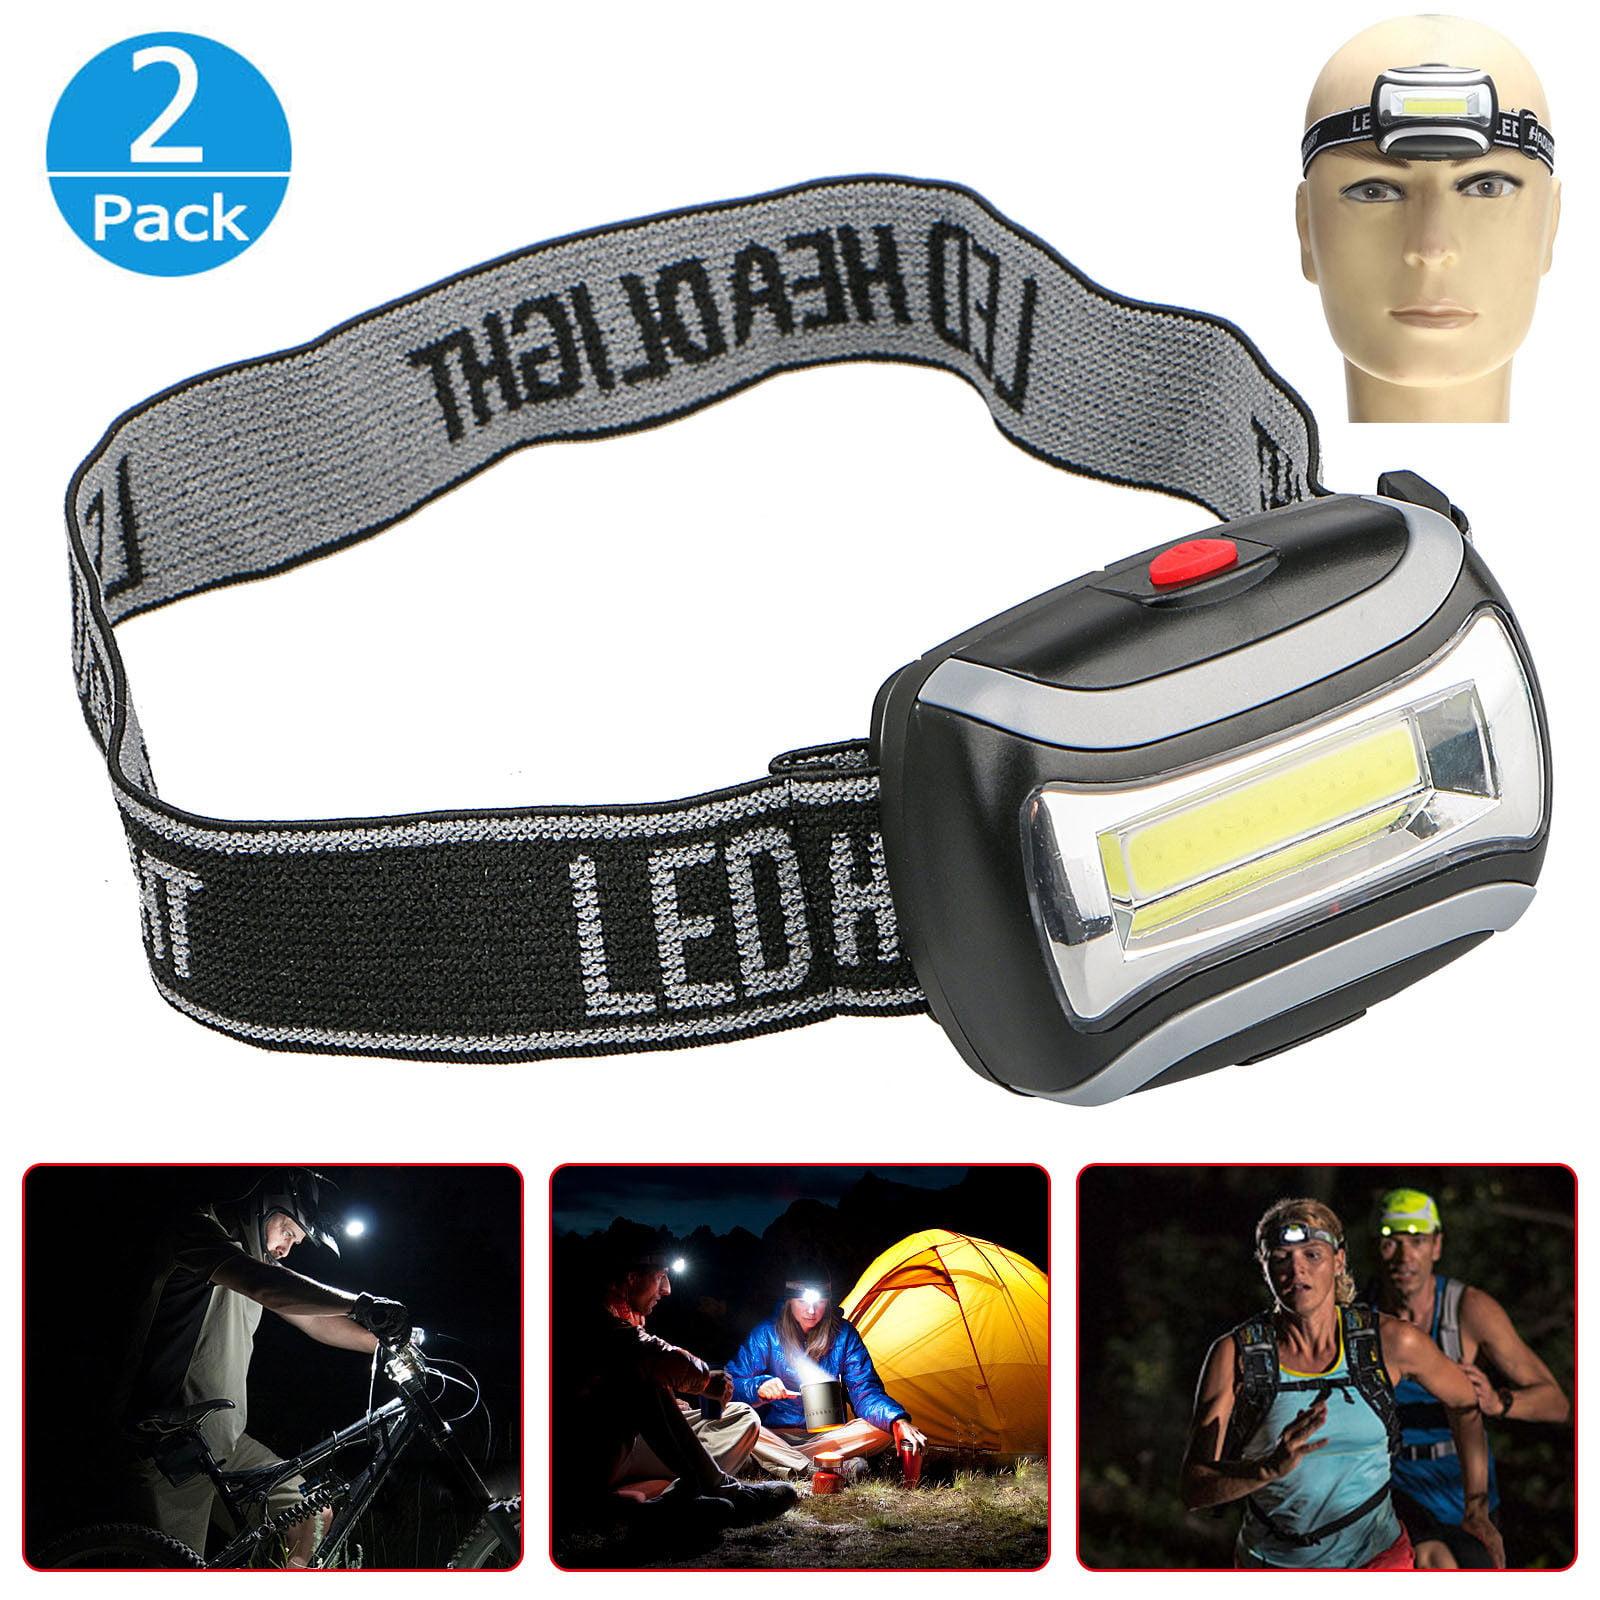 2-pack 5W 800LM 3-Mode COB Head Light LED Headlamp Flashlight for Camping Night Fishing